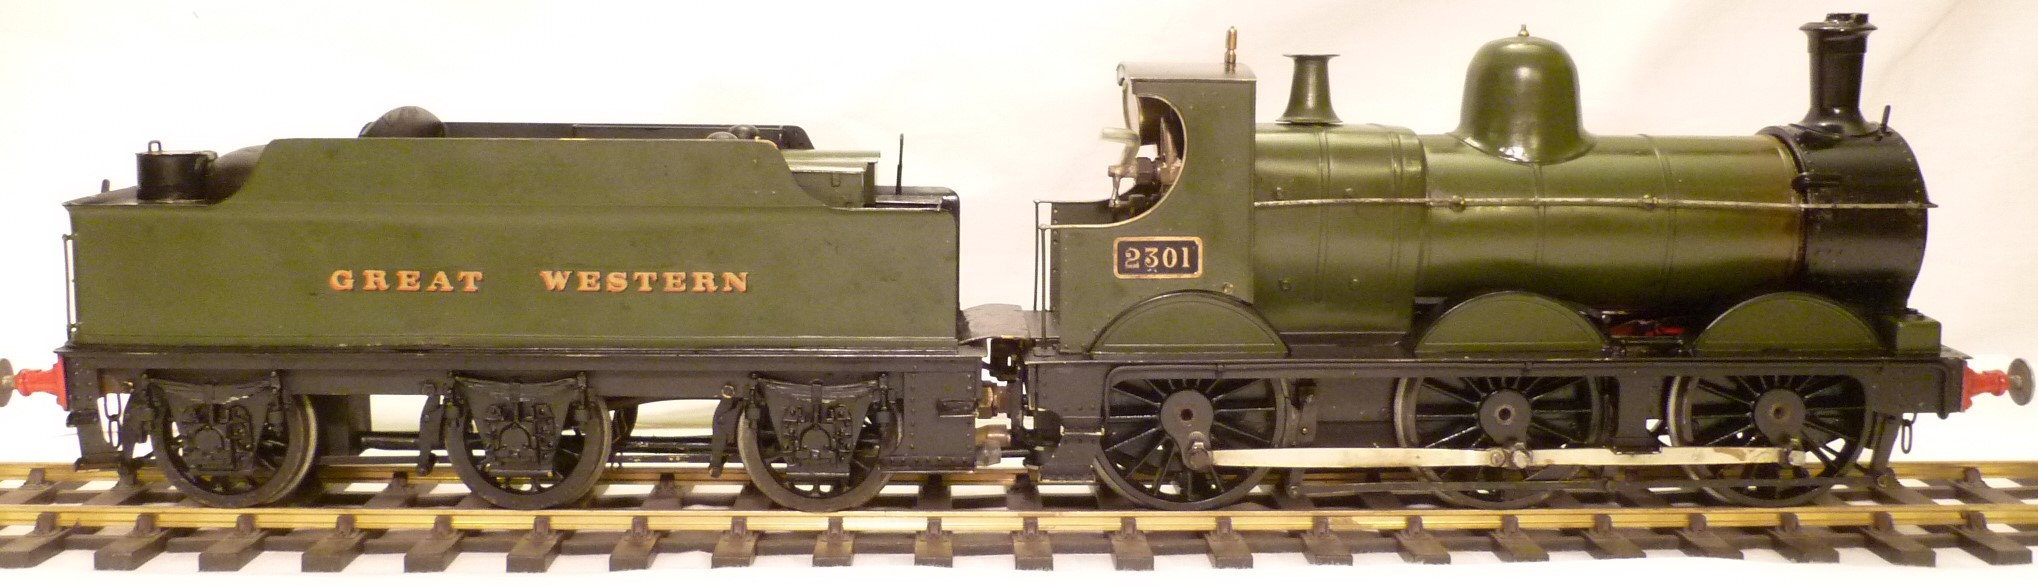 P1110555